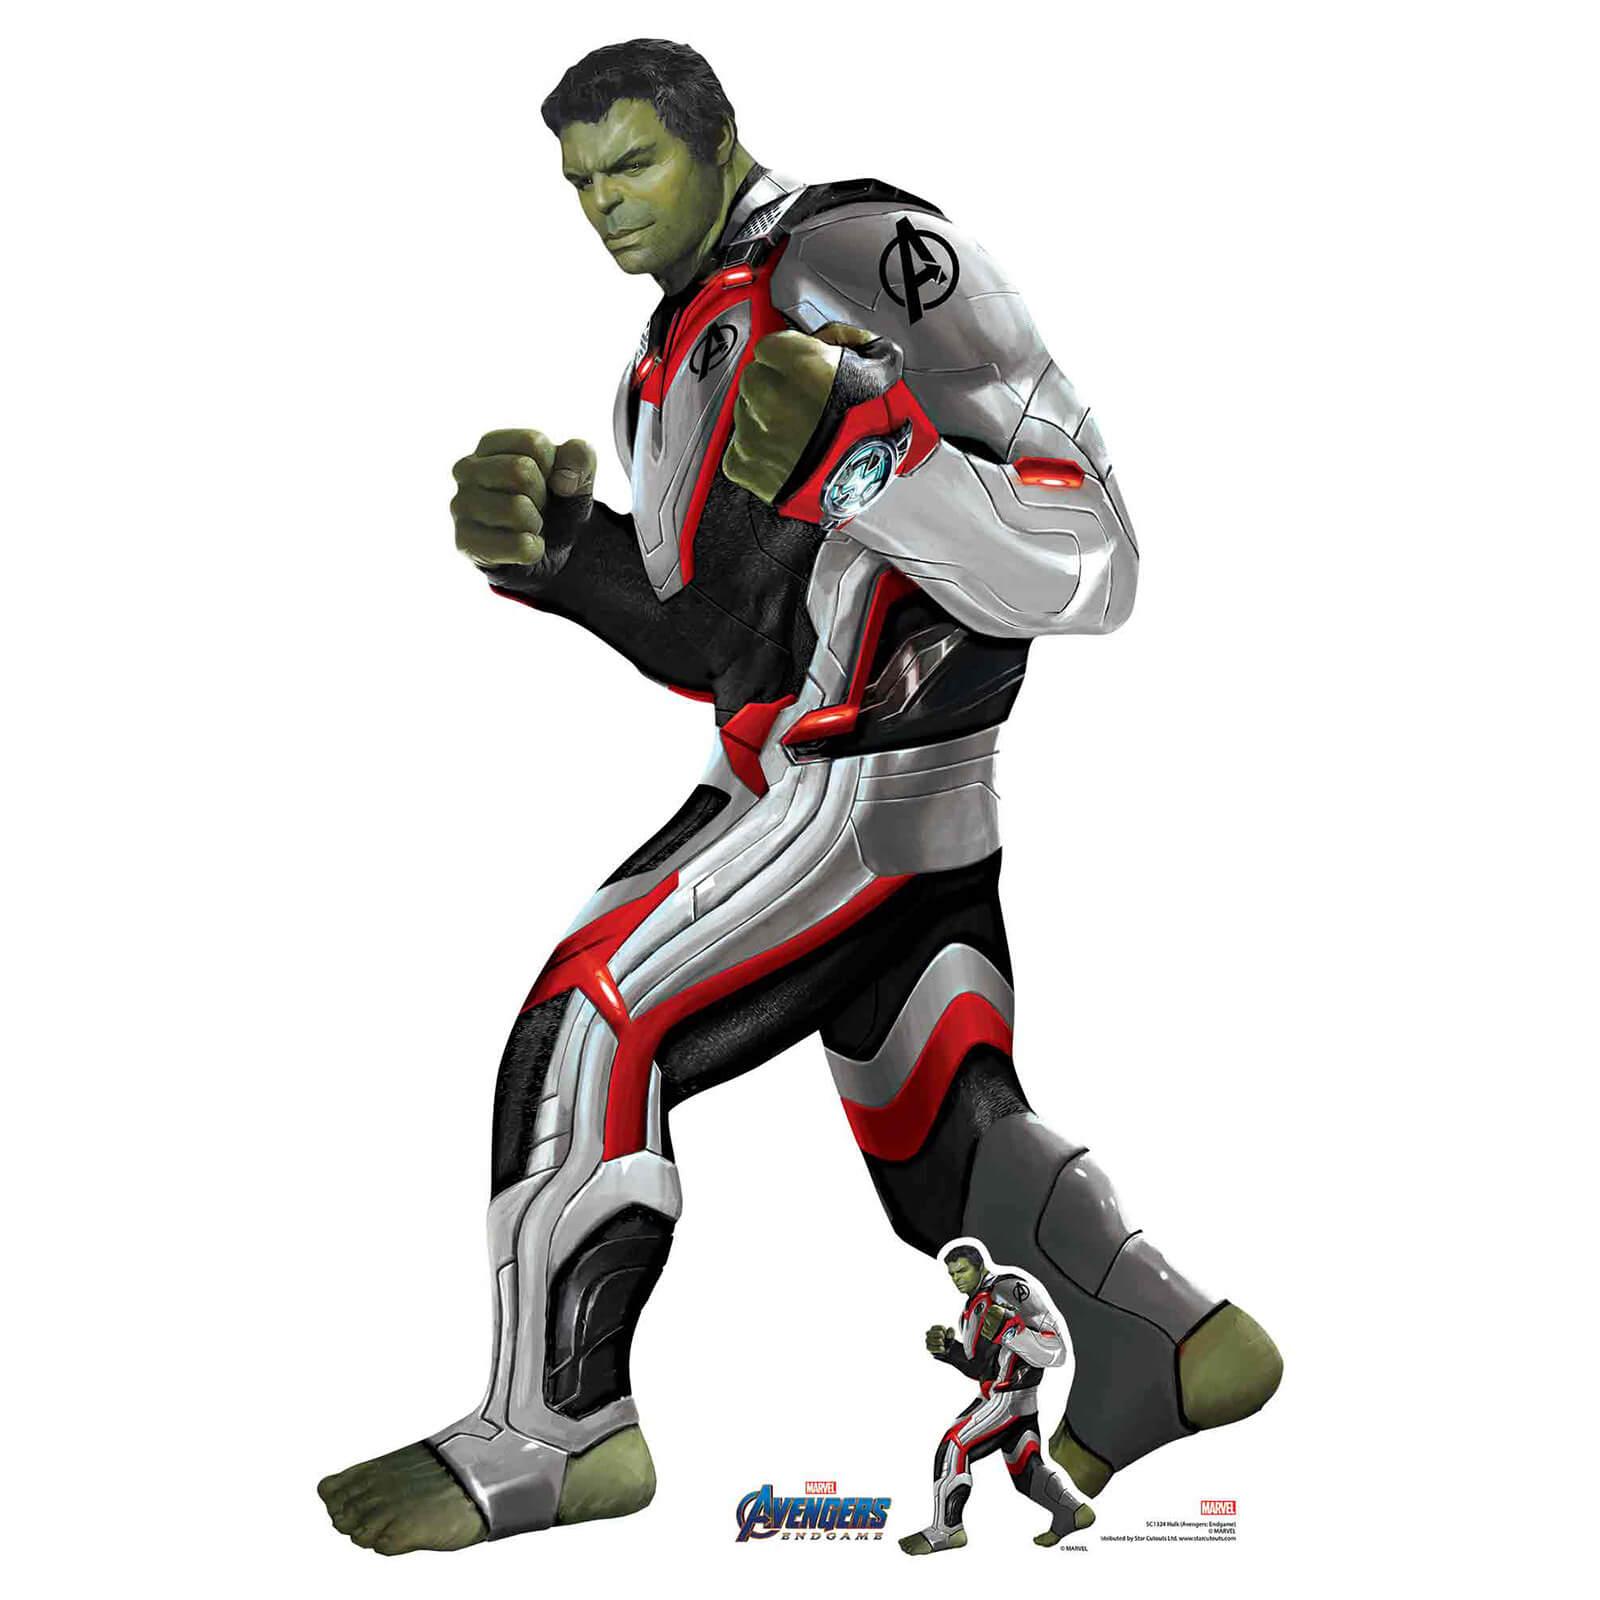 Image of Marvel Hulk (Quantum Suit) Avengers Endgame Mini Carboard Cut-Out